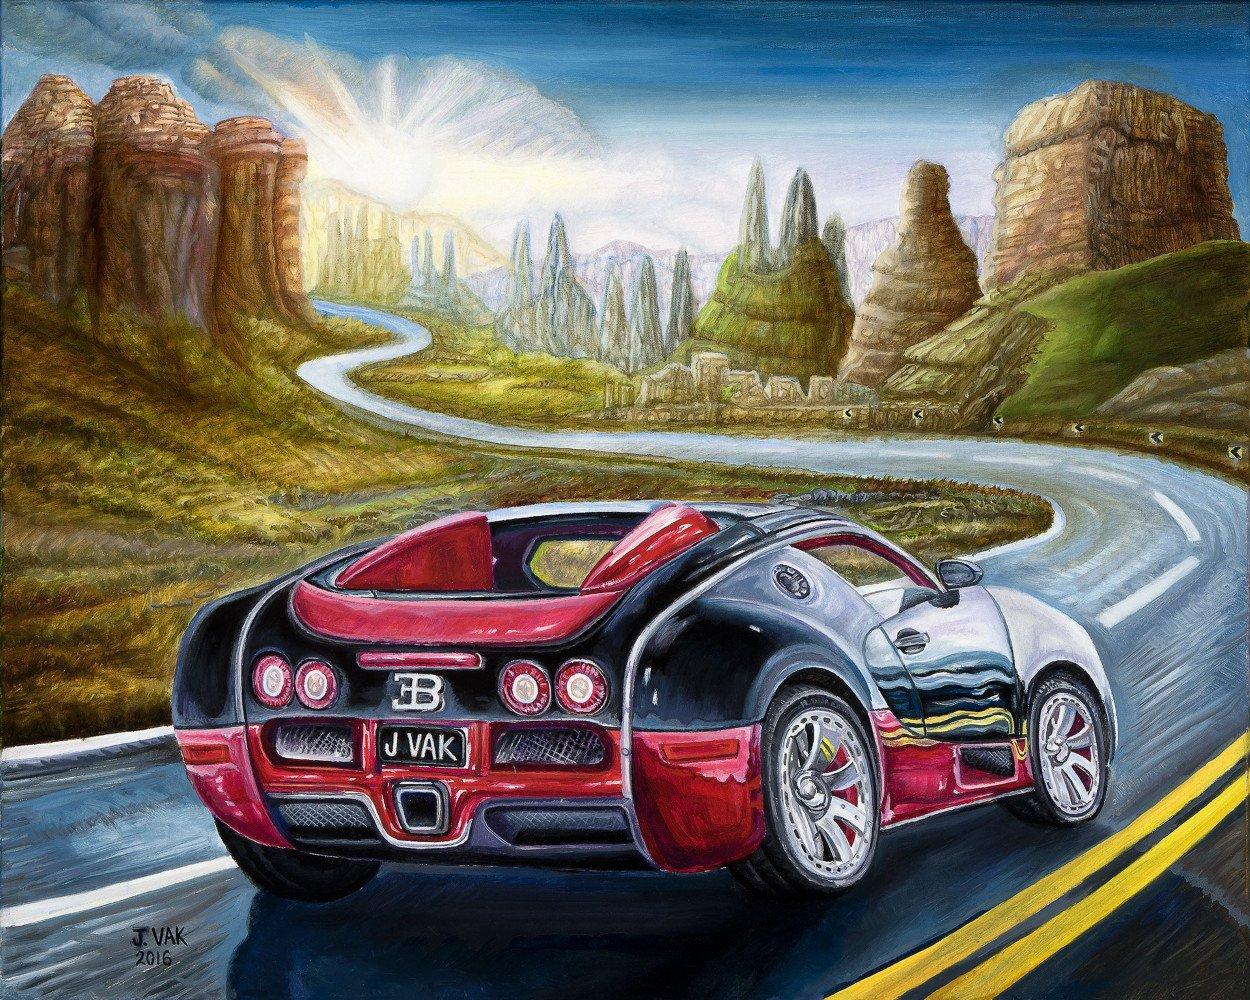 2014 Bugatti Veyron Fbg    24 X 30 Original Oil             $2500             2016